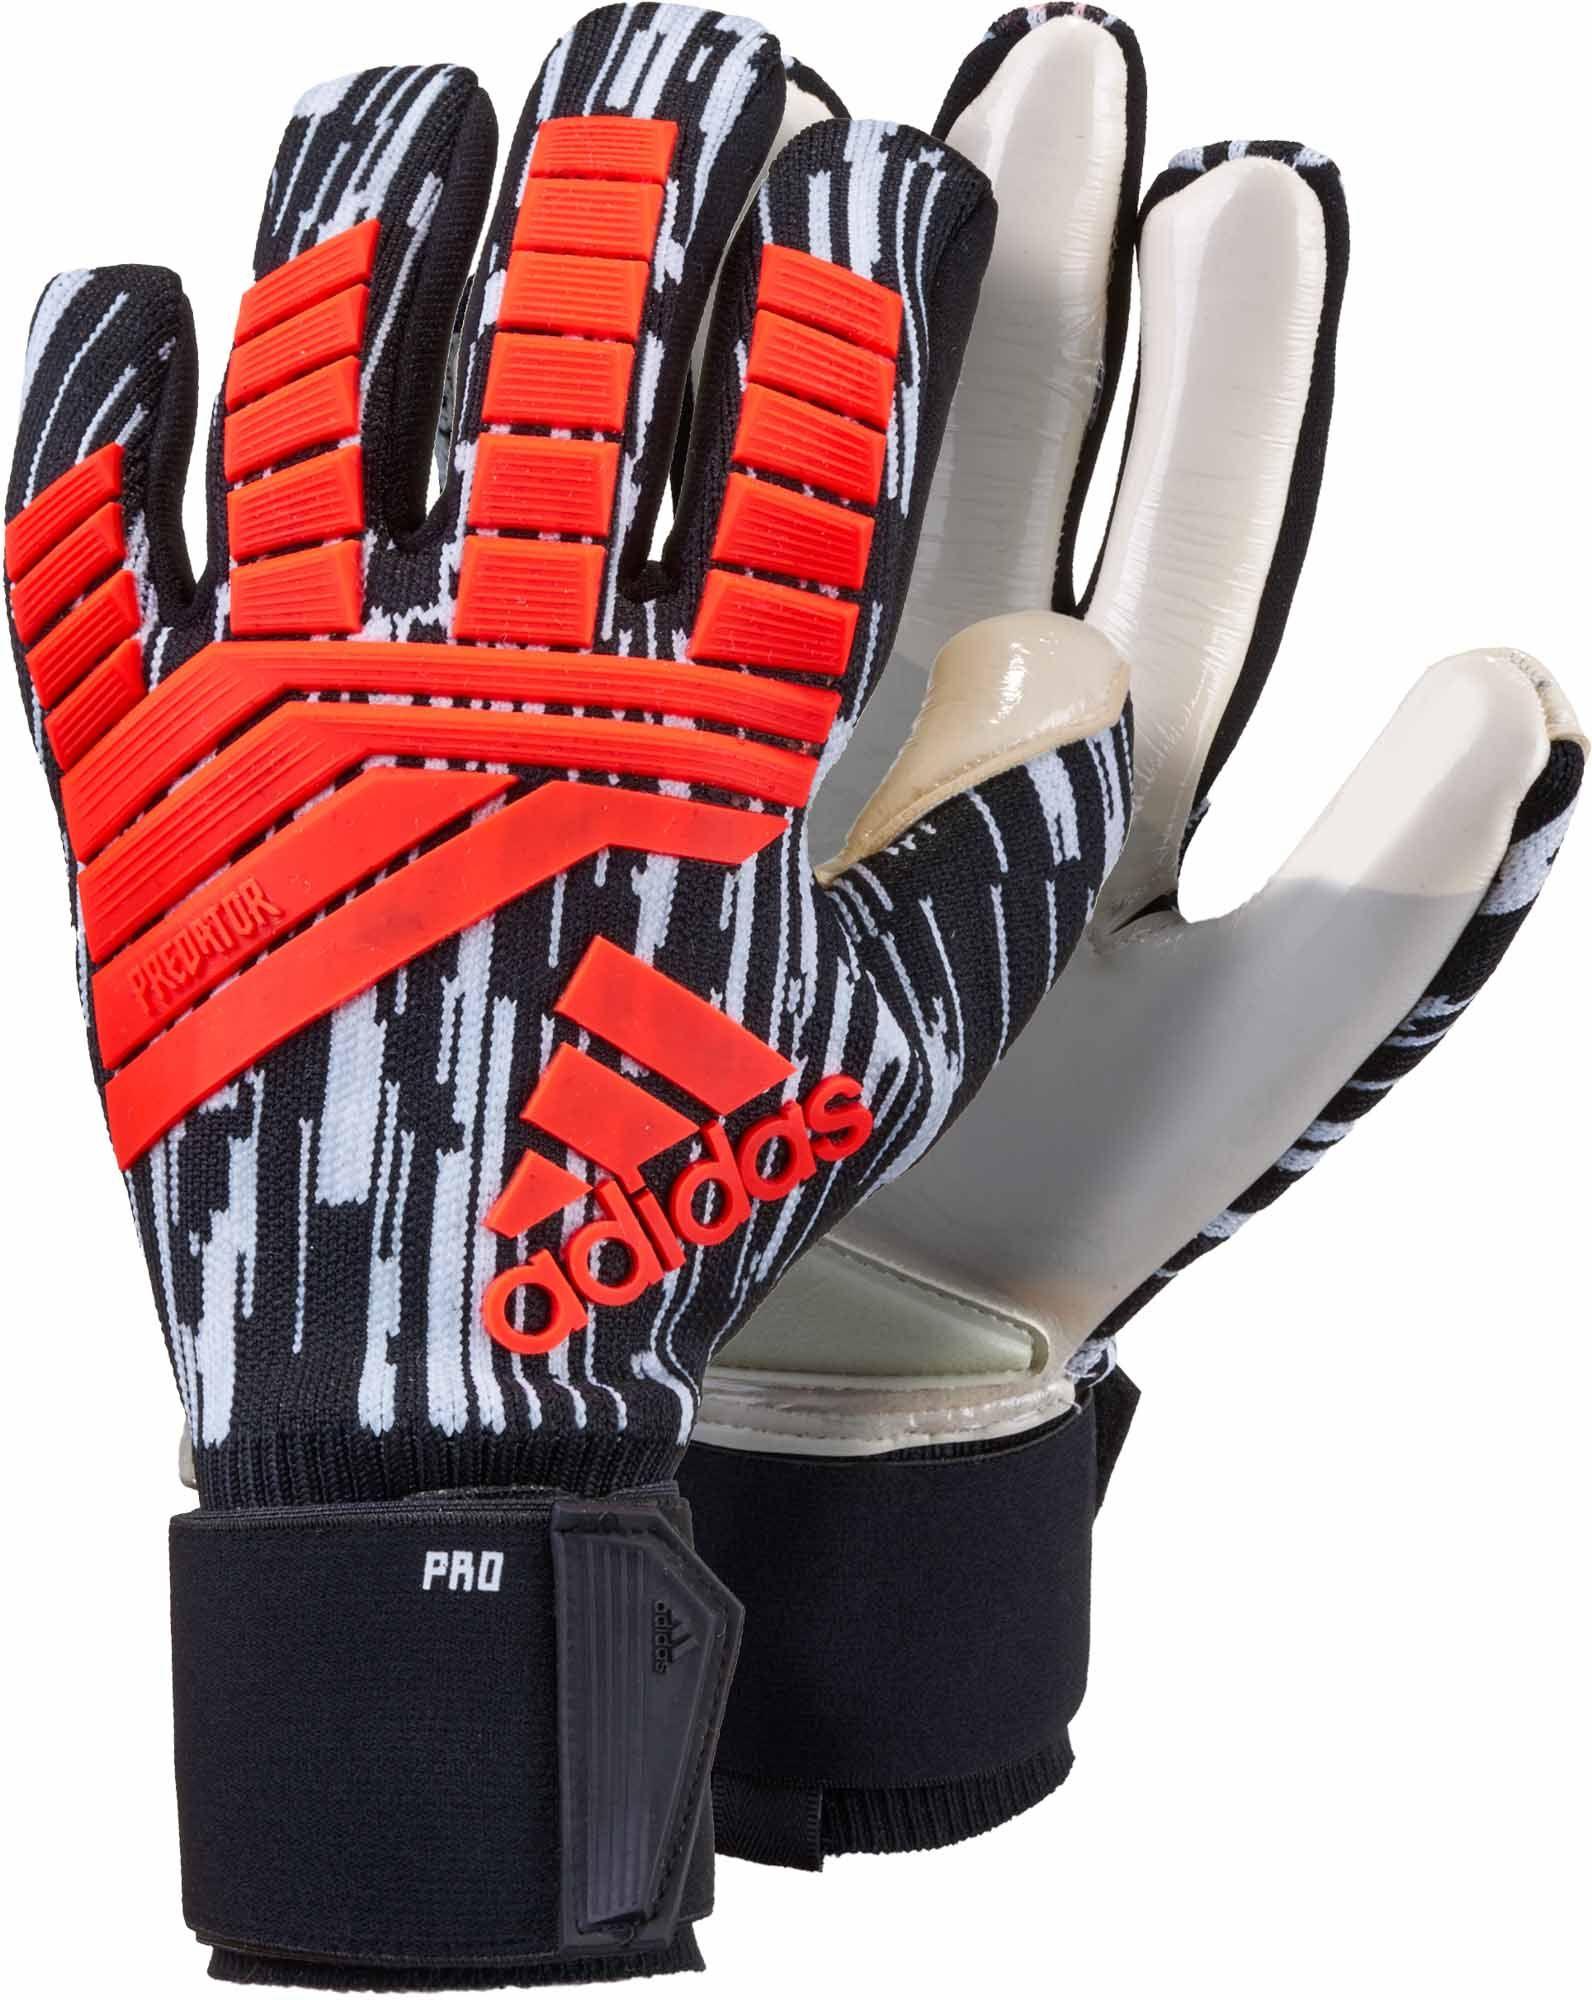 Adidas Predator Pro Goalkeeper Gloves Manuel Neuer Solar Red Black Adidas Predator Goalkeeper Gloves Goalkeeper